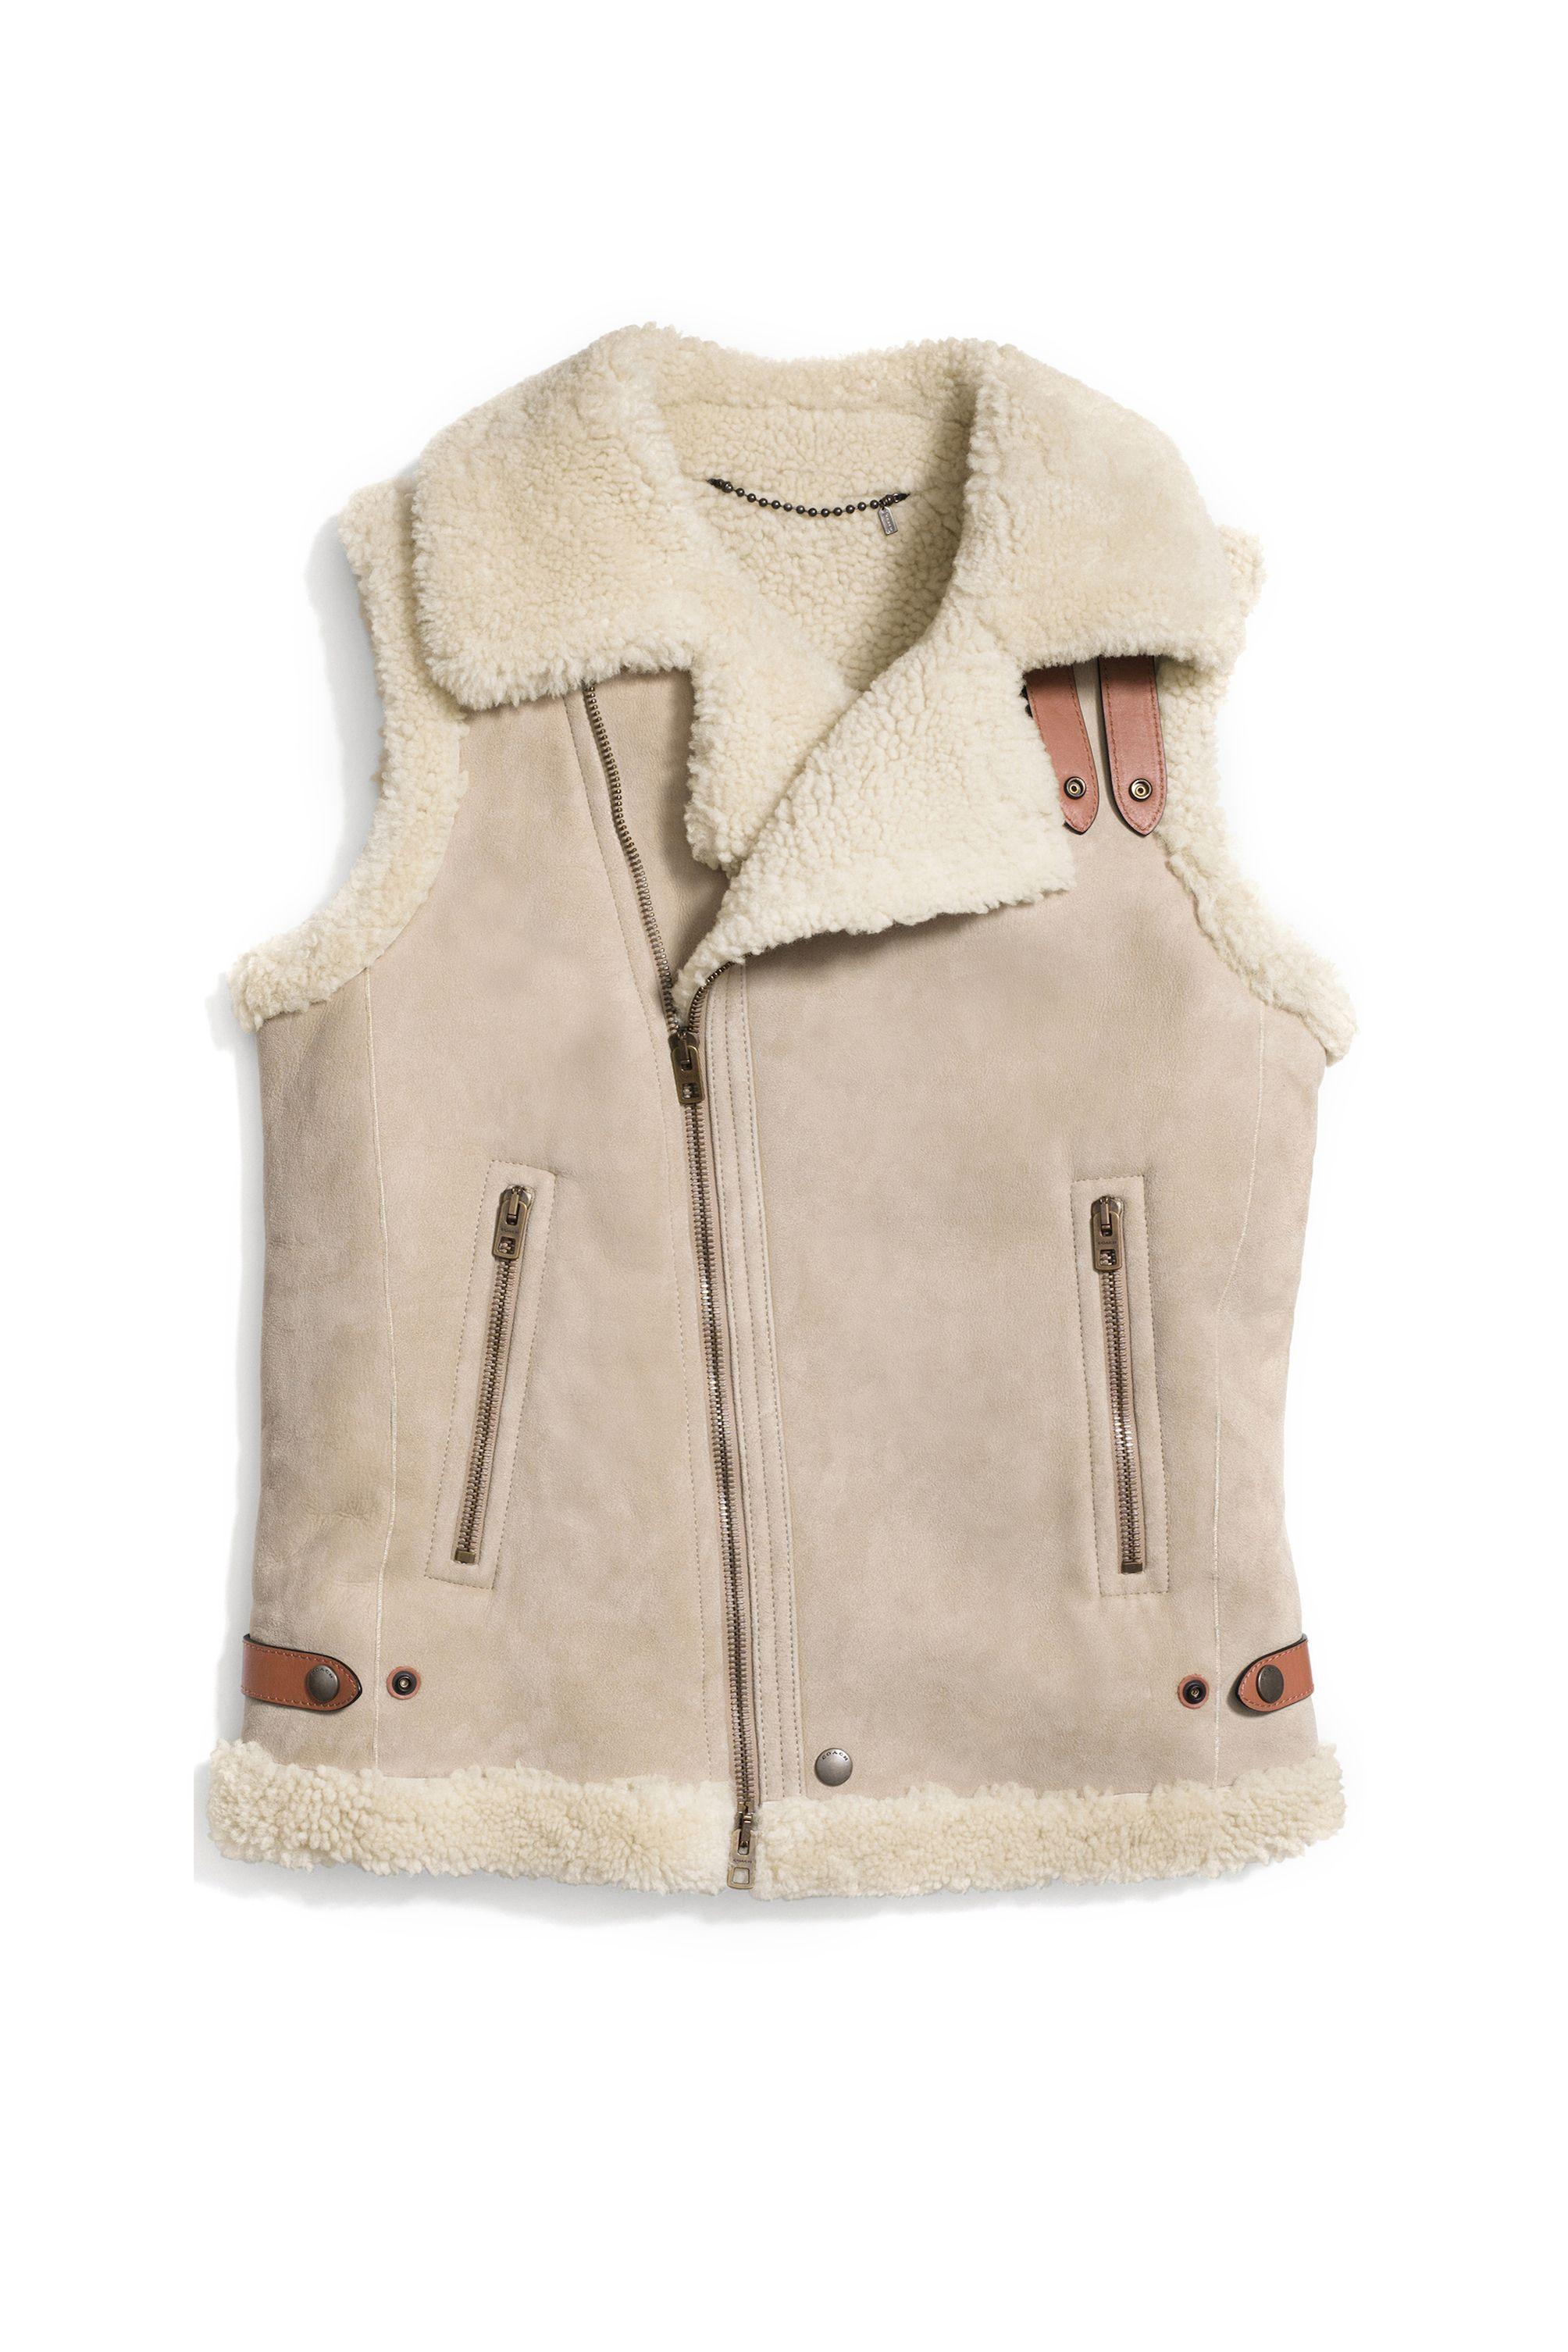 "<p><strong>Coach</strong> vest, $995, <a href=""http://www.coach.com/coach-designer-coats-sheepskin-moto-vest/85932.html?cid=D_B_HBZ_9849"" target=""_blank"">coach.com</a>.</p>"